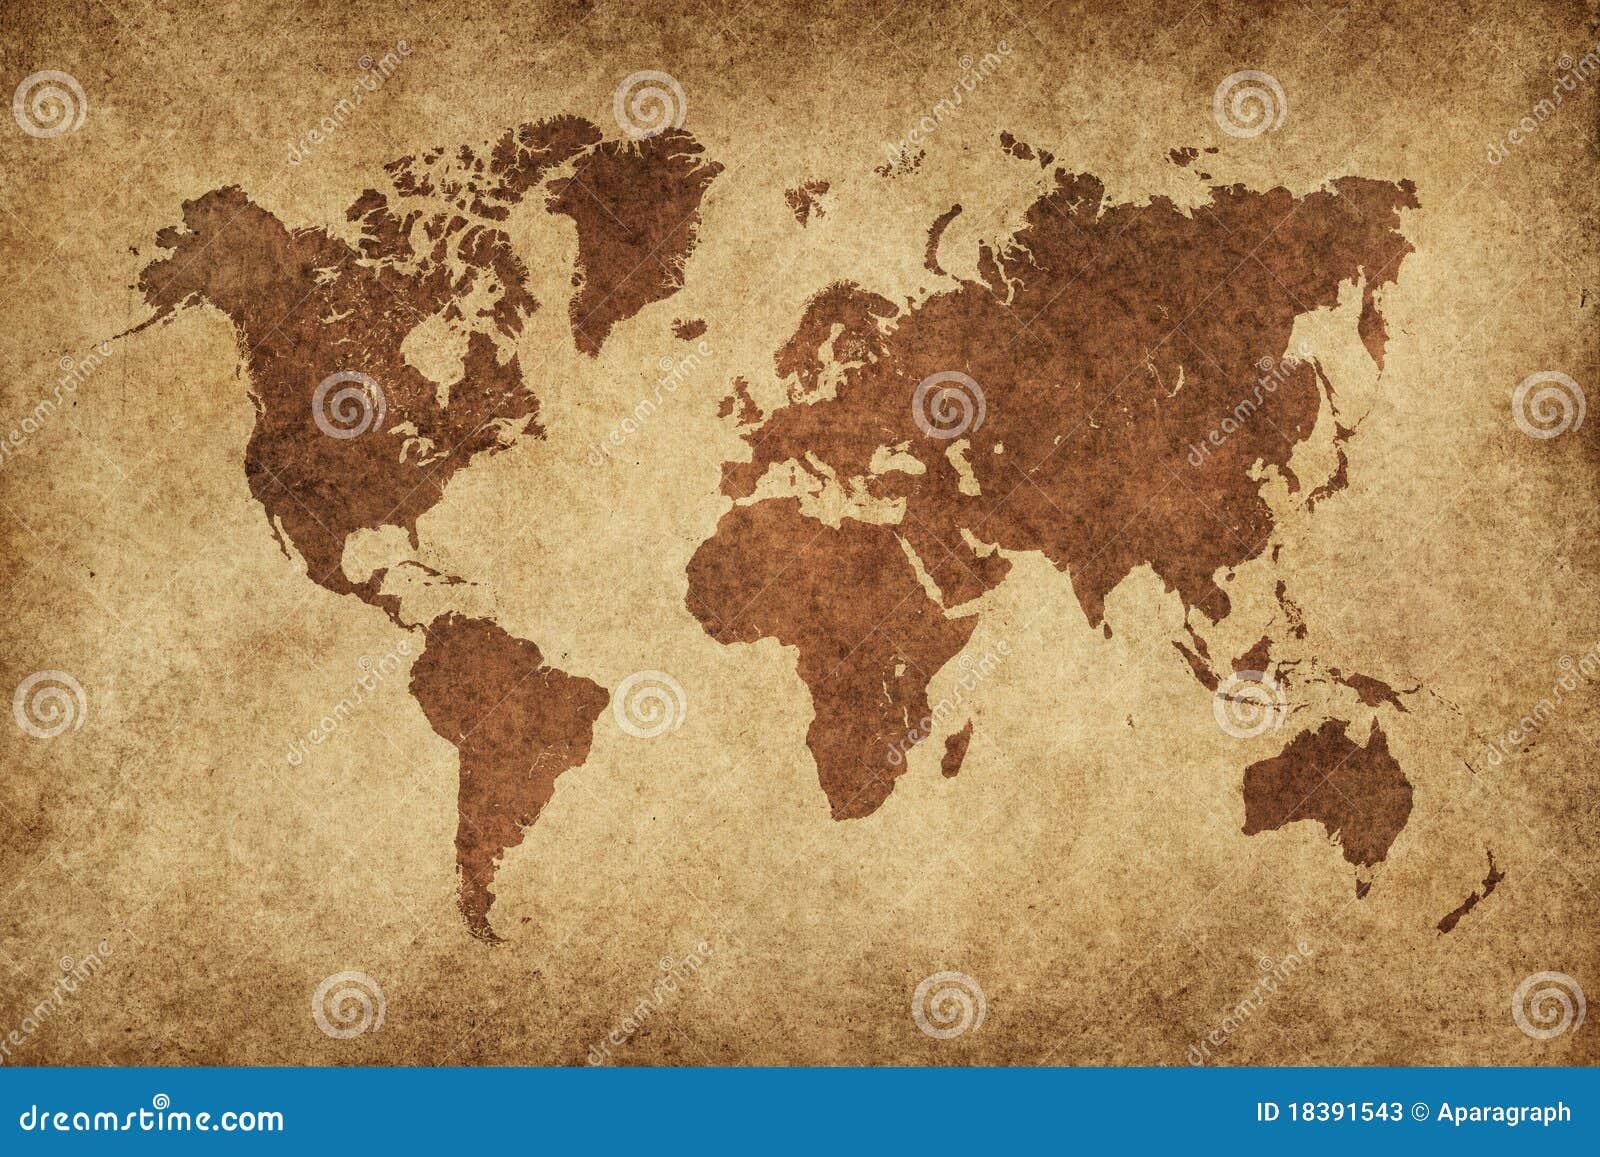 world map in vintage pattern royalty free stock image. Black Bedroom Furniture Sets. Home Design Ideas